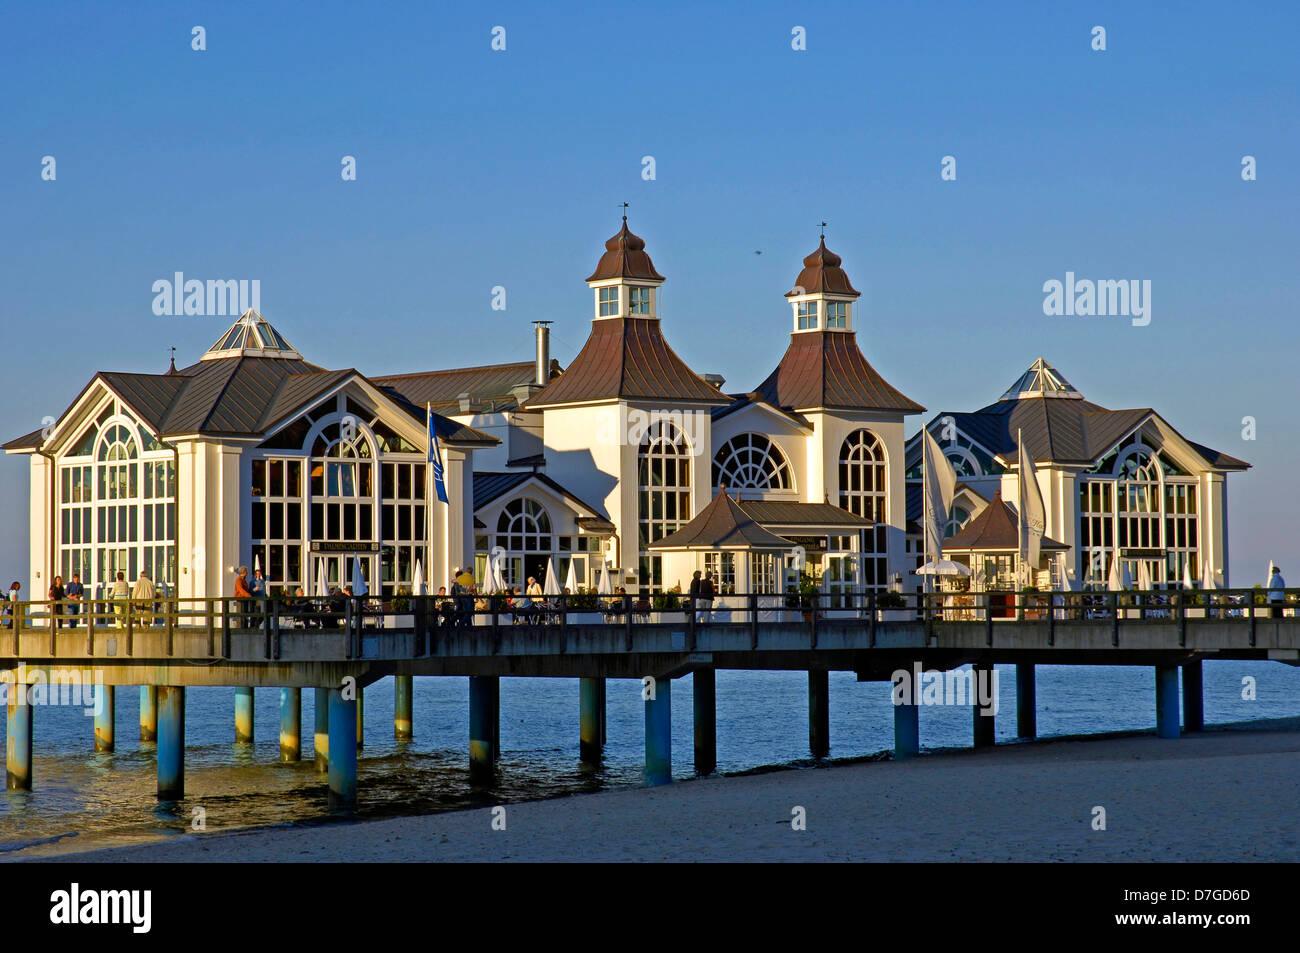 Germany, Mecklenburg-West Pomerania, island Rügen, Sellin, sea bridge, the Baltic Sea - Stock Image